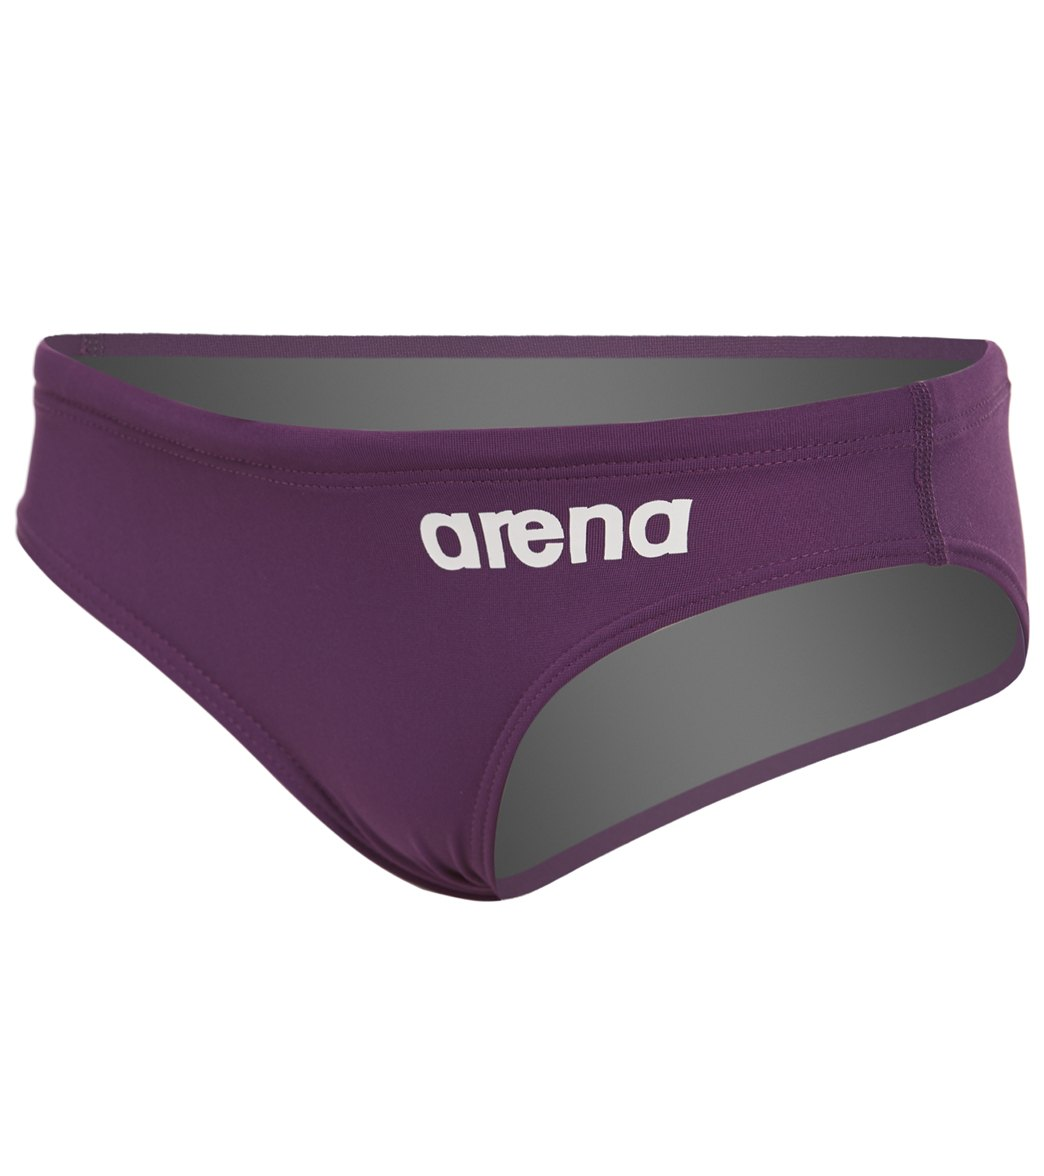 cf64db993333e Arena Boys' Skys Swim Brief at SwimOutlet.com